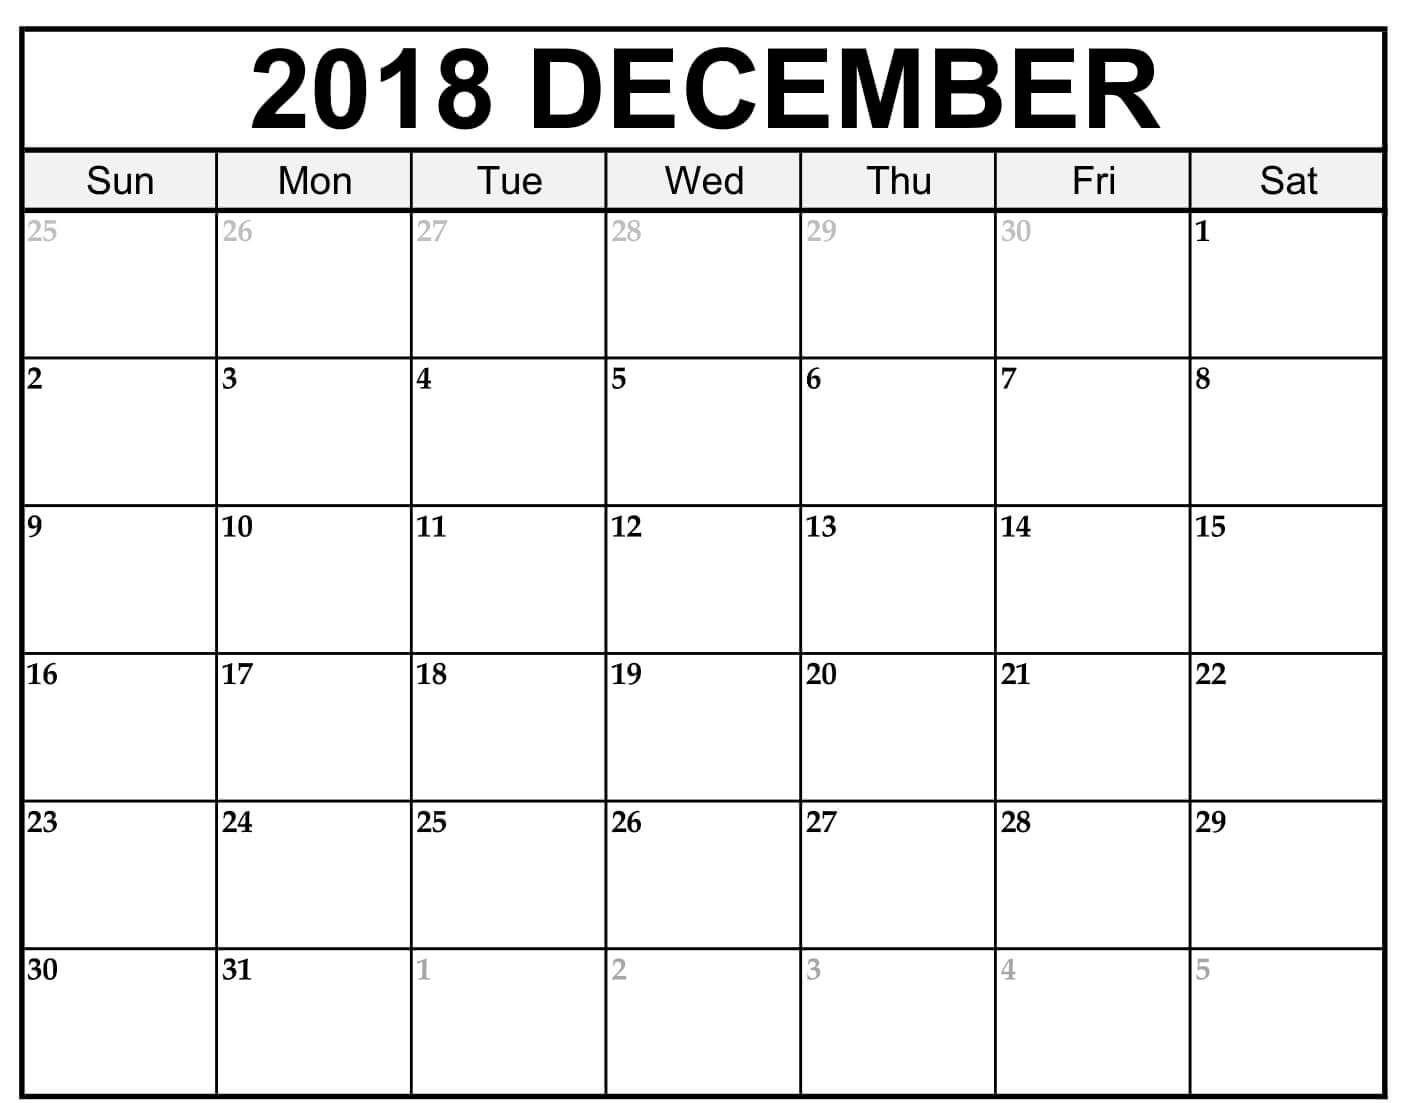 December Calendar 2018 Template Pdf Blue Frame December 2018